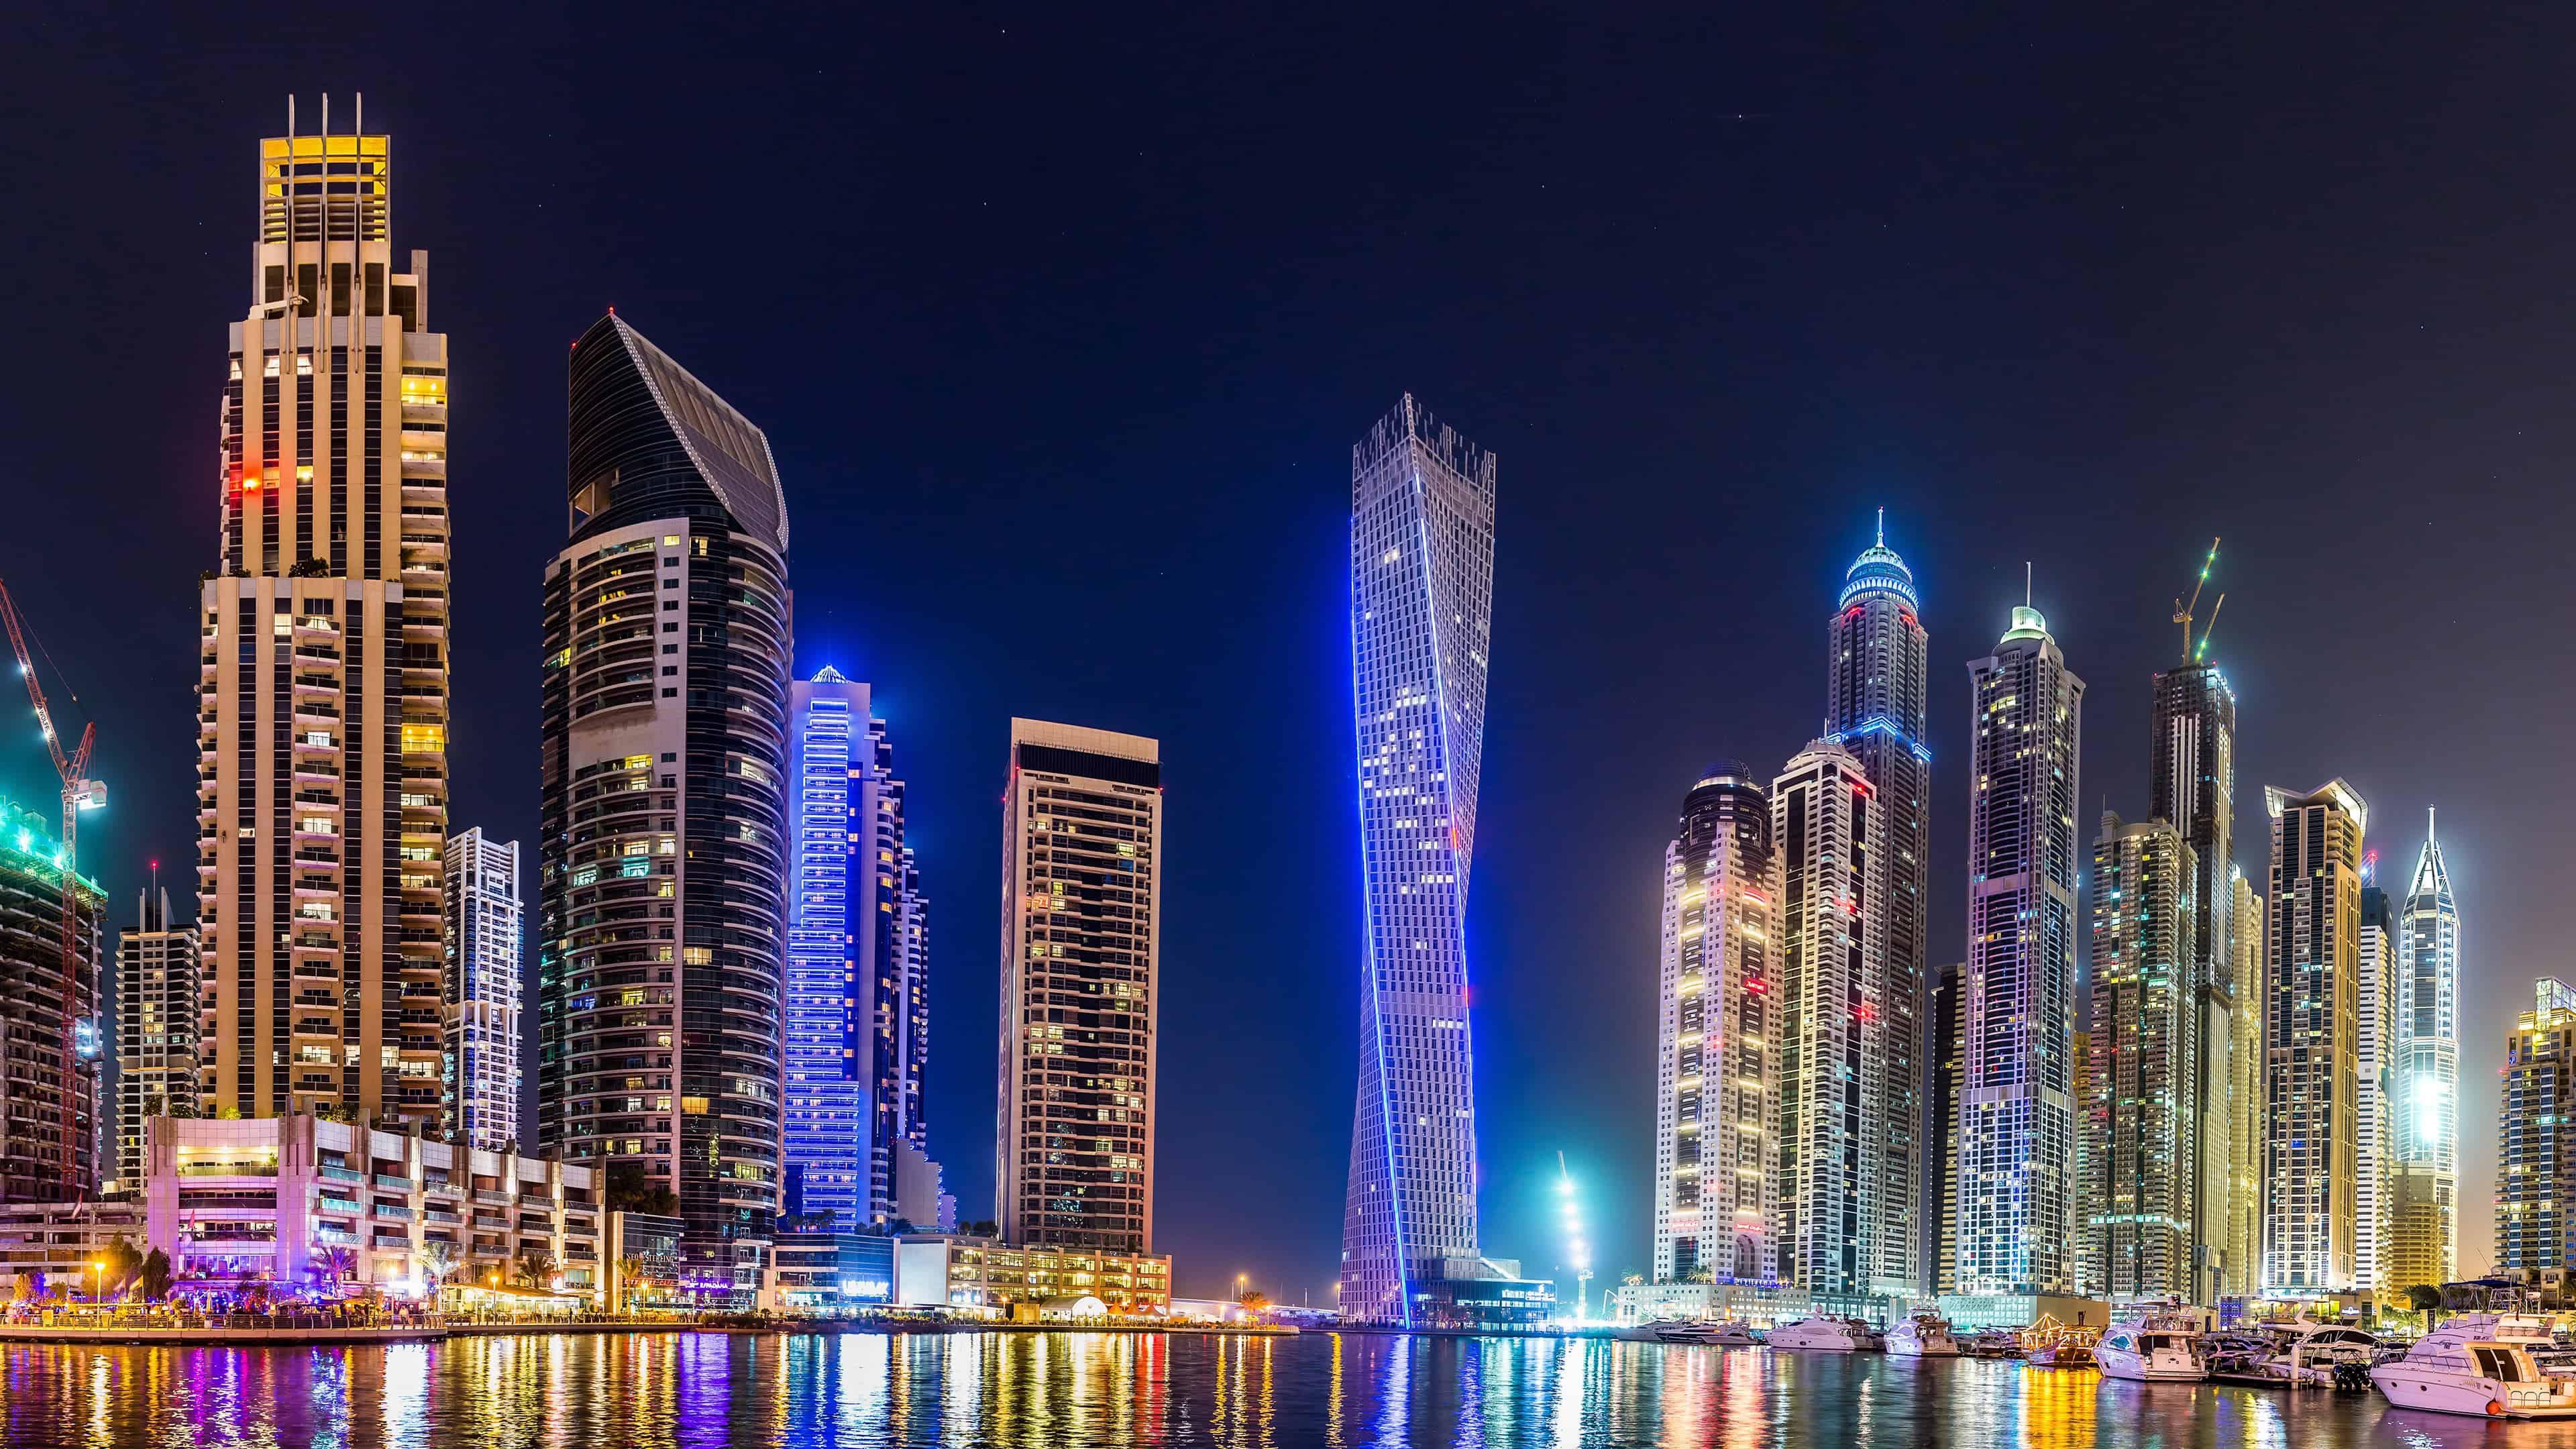 Dubai Skyline At Night Uhd 4k Wallpaper Pixelz